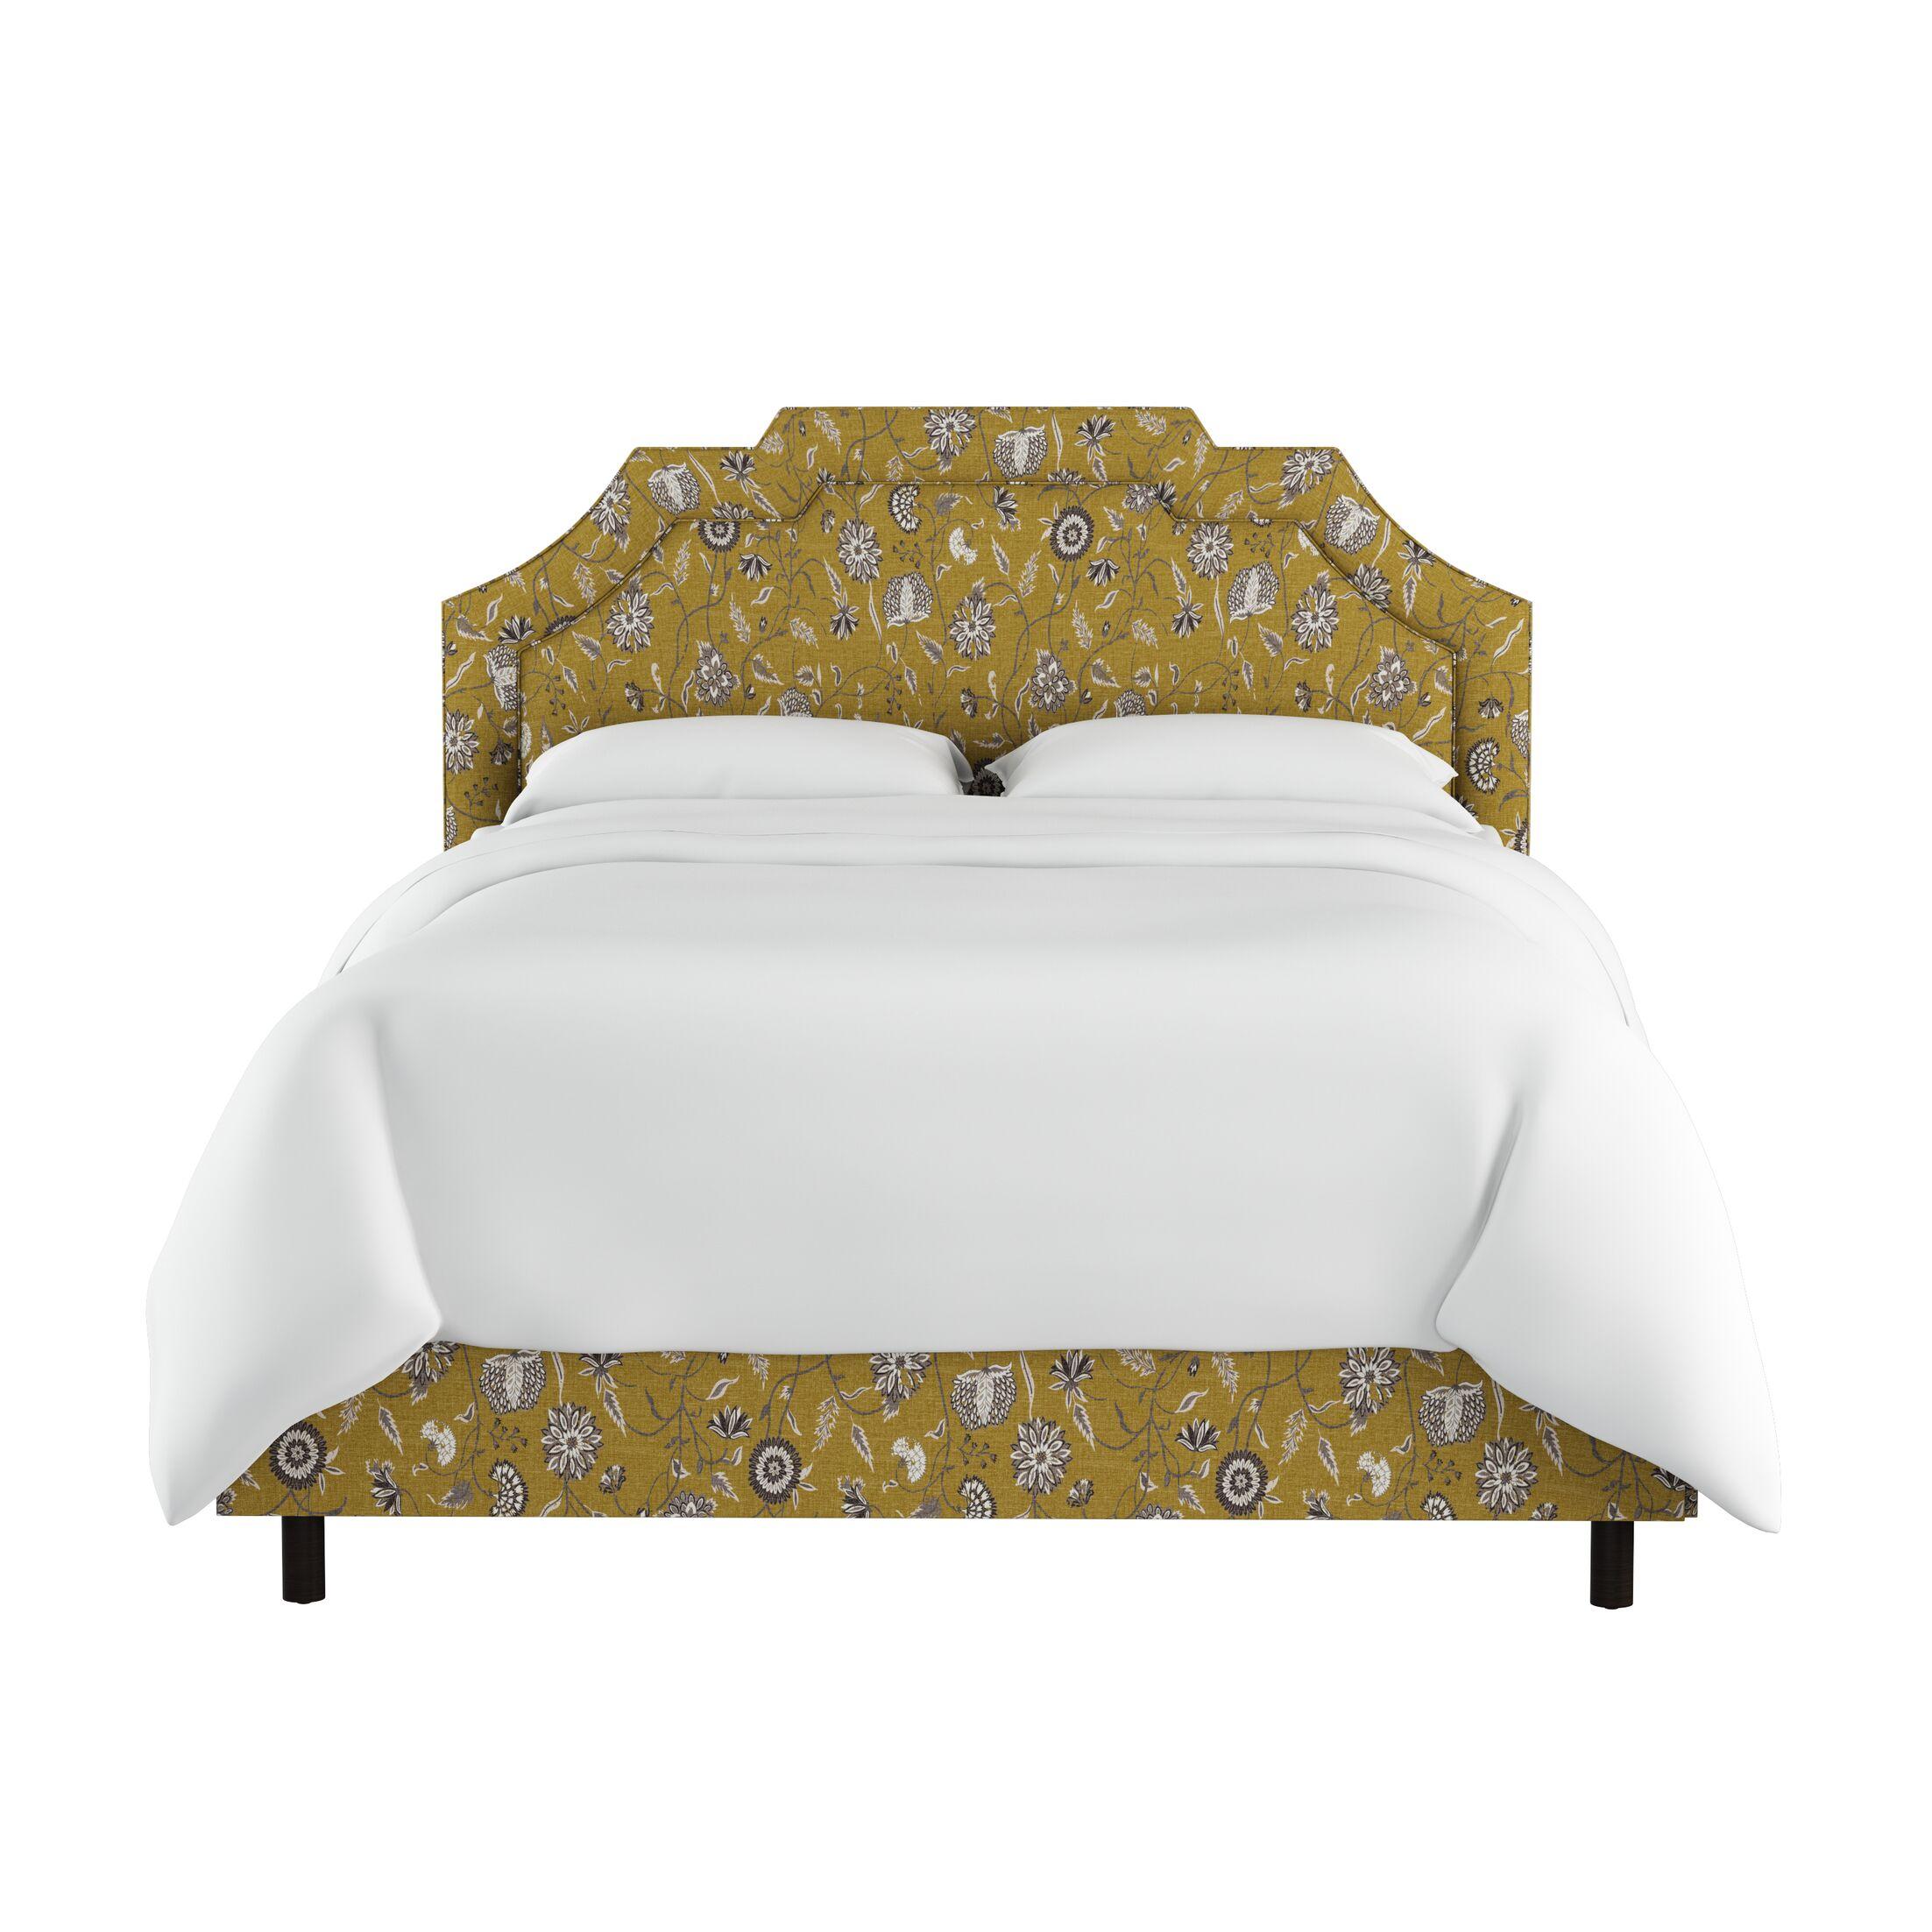 Edmondson Linen Upholstered Panel Bed Size: King, Color: Yellow